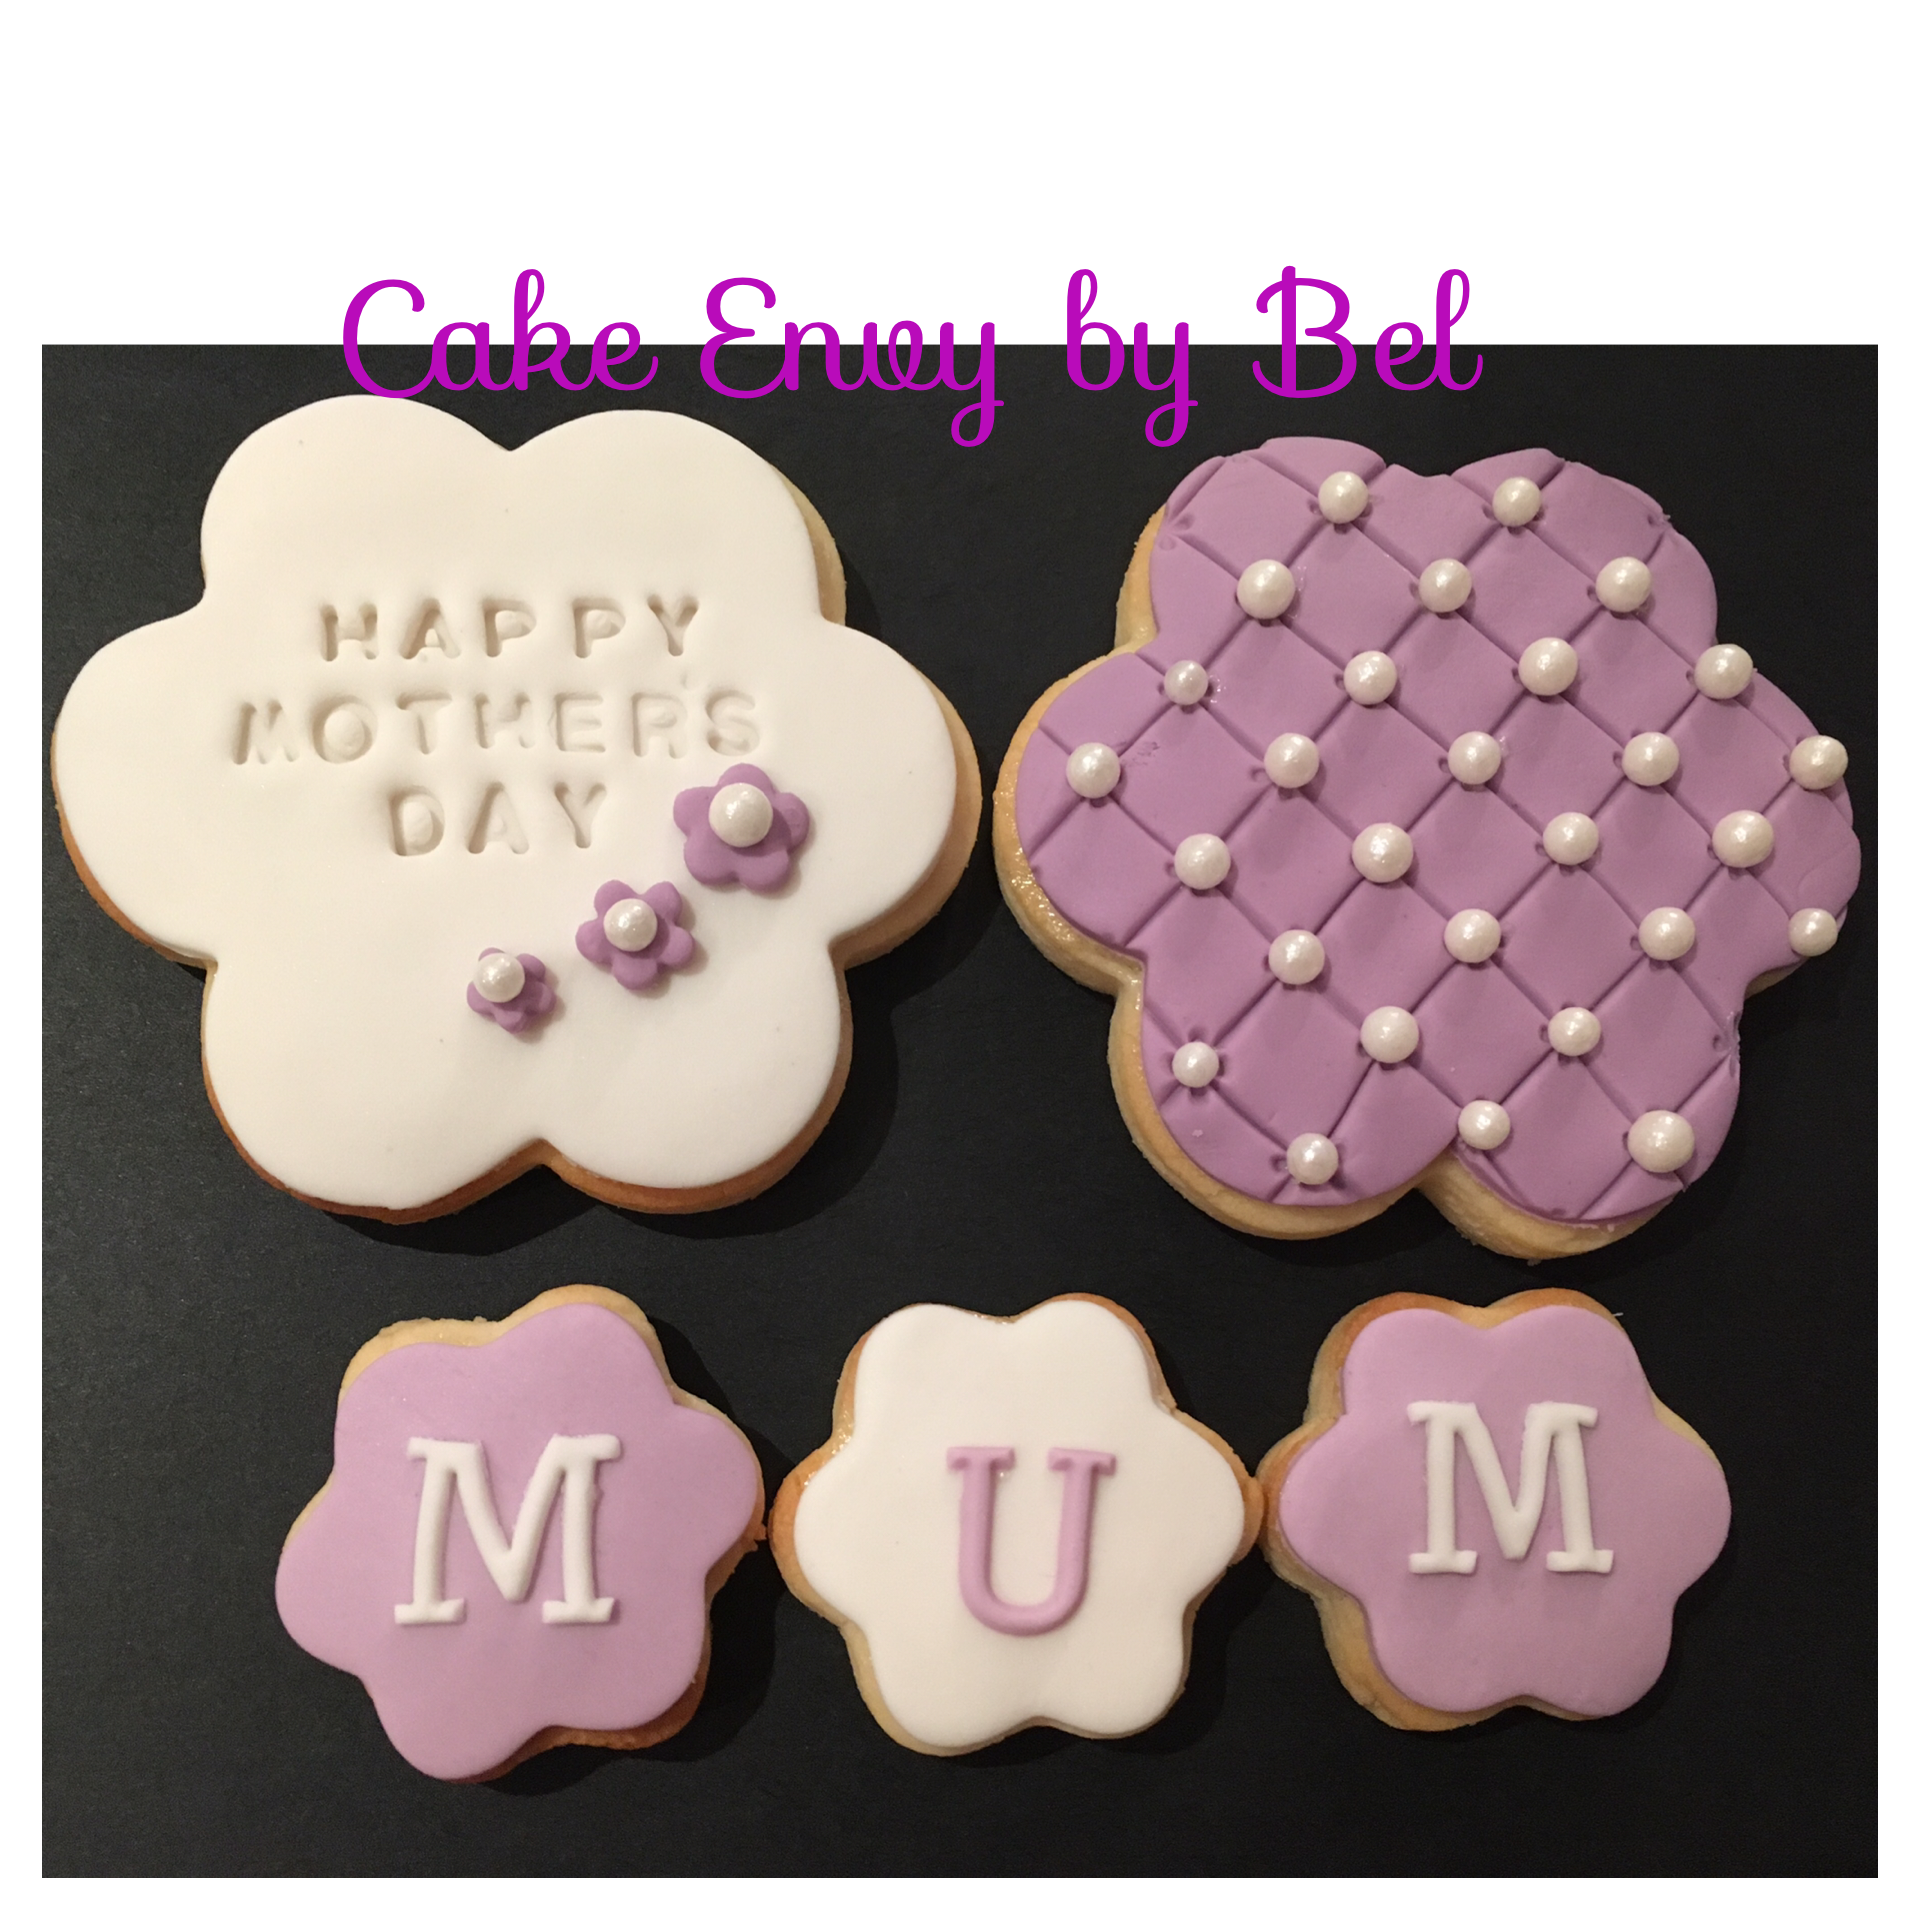 Cookies Madeley Cake Envy By Bel